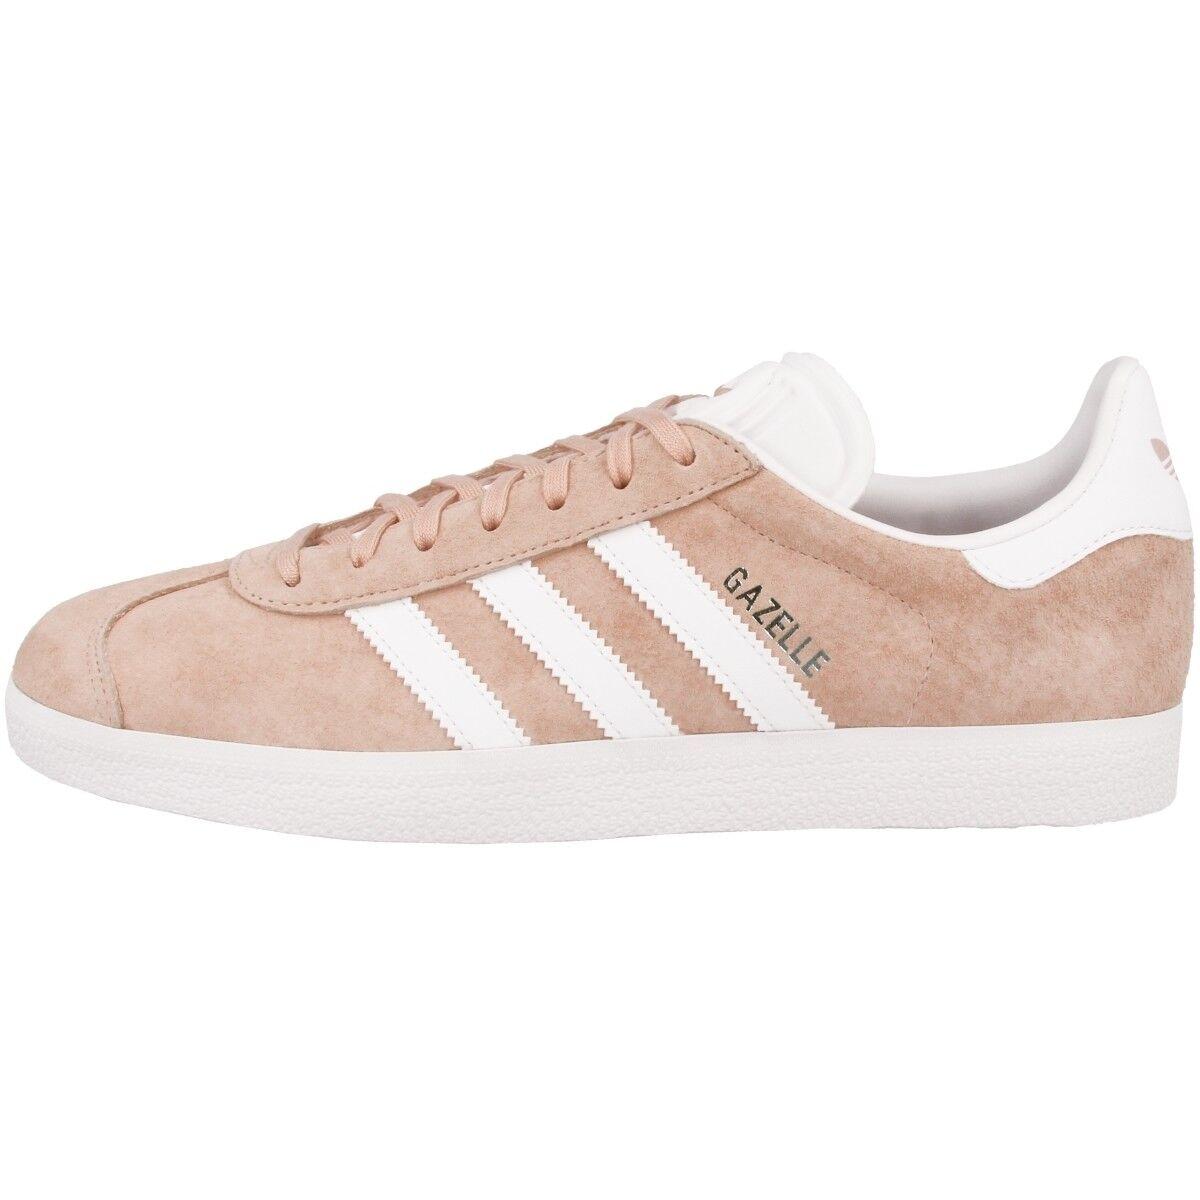 ADIDAS Gazelle Scarpe Retro scarpe da ginnastica Tempo Libero Uomo scarpe da ginnastica rosa bianca bb5472